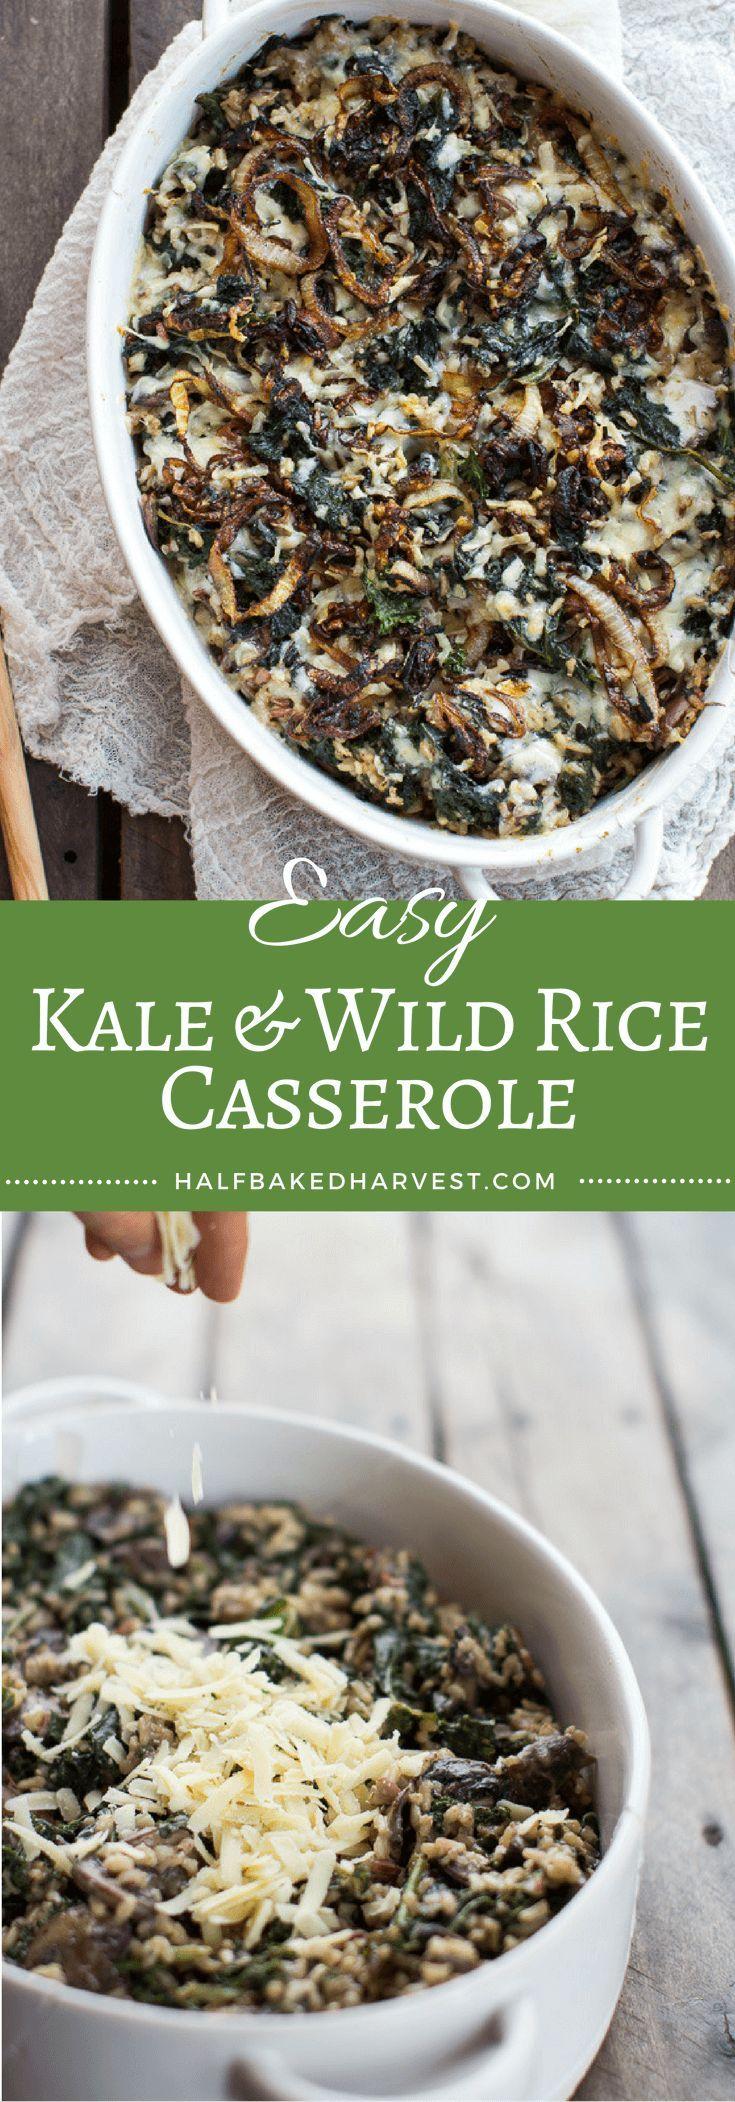 Kale and Wild Rice Casserole   http://halfbakedharvest.com /hbharvest/